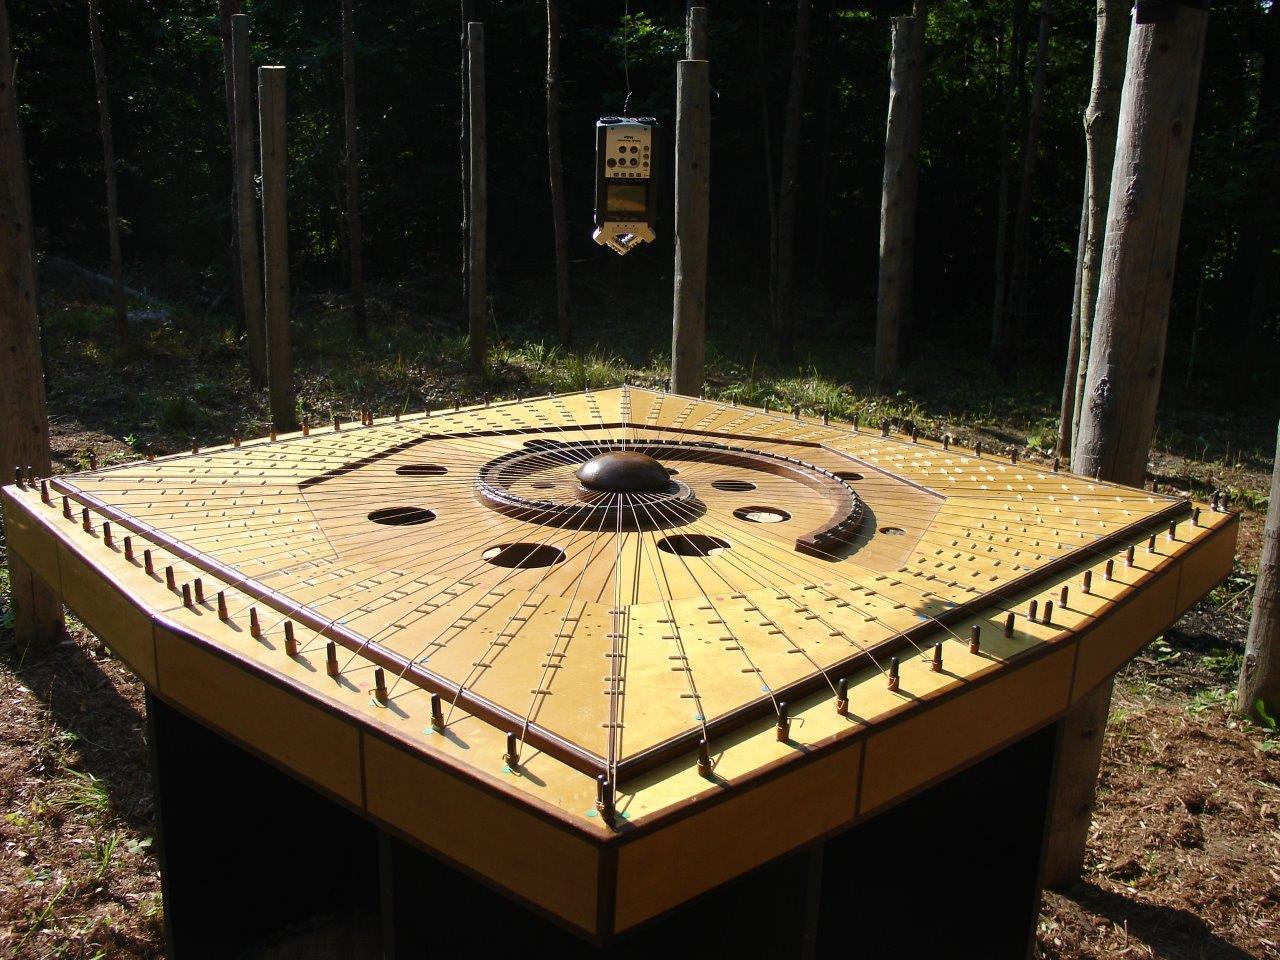 5b-Celestiall-Harp-Forest-Woodhenge-setup-195